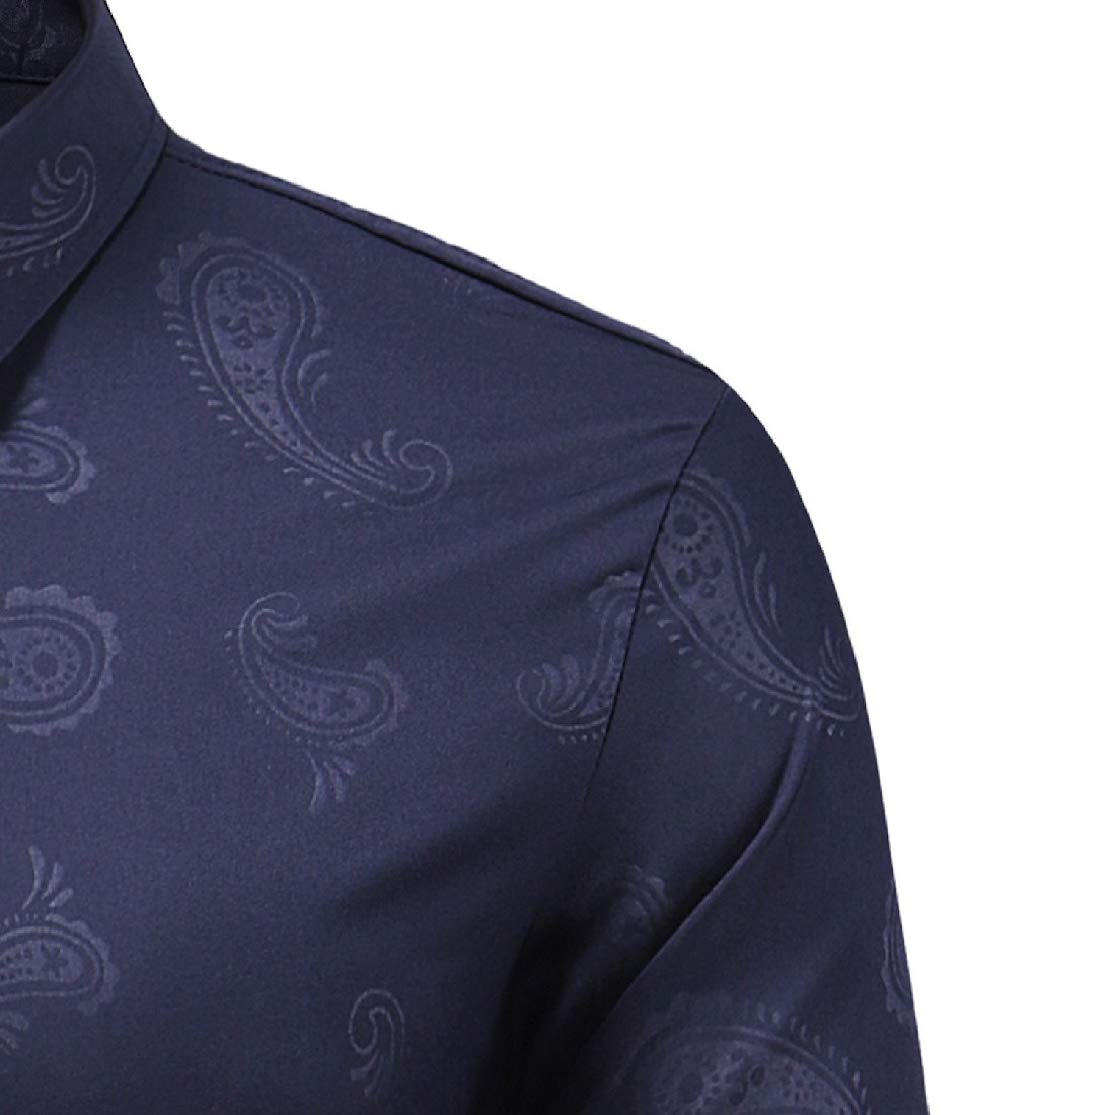 Colourful Mens Lapel Collar Dark Bands Open Front Long Sleeve Casual Dress Shirt